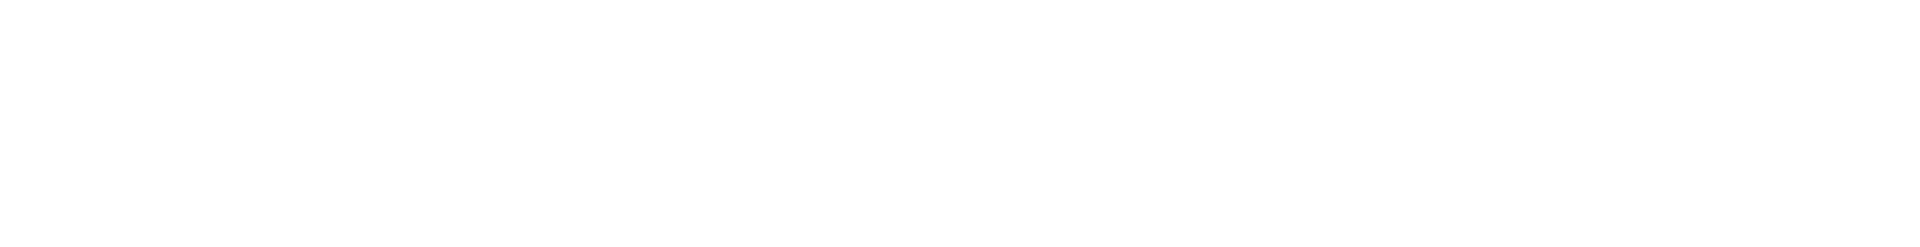 Forge-Legend-logo-horiz2-nodistress-white-01-1920w